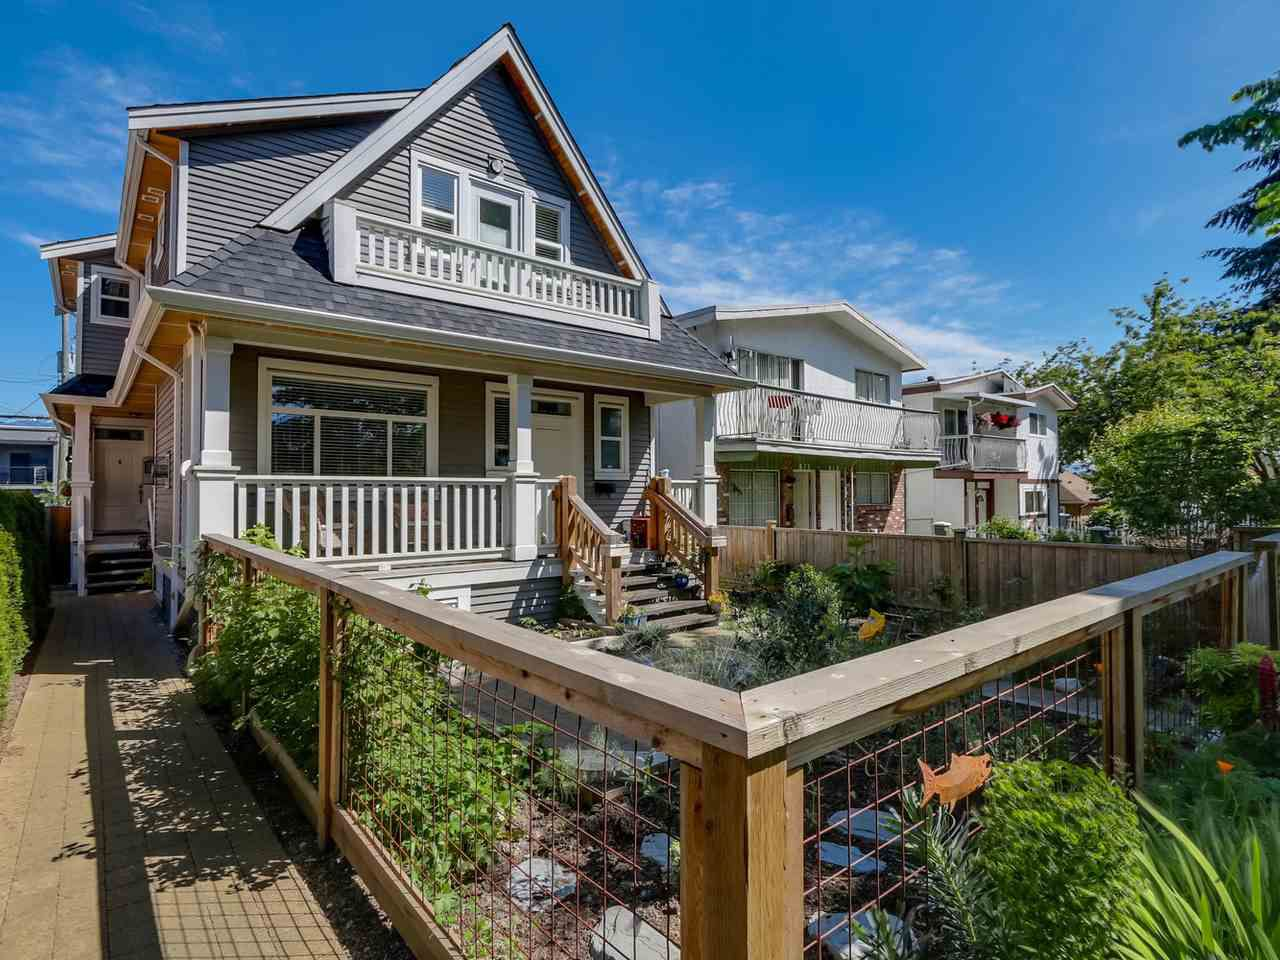 Main Photo: 865 E 10TH Avenue in Vancouver: Mount Pleasant VE House 1/2 Duplex for sale (Vancouver East)  : MLS®# R2068935